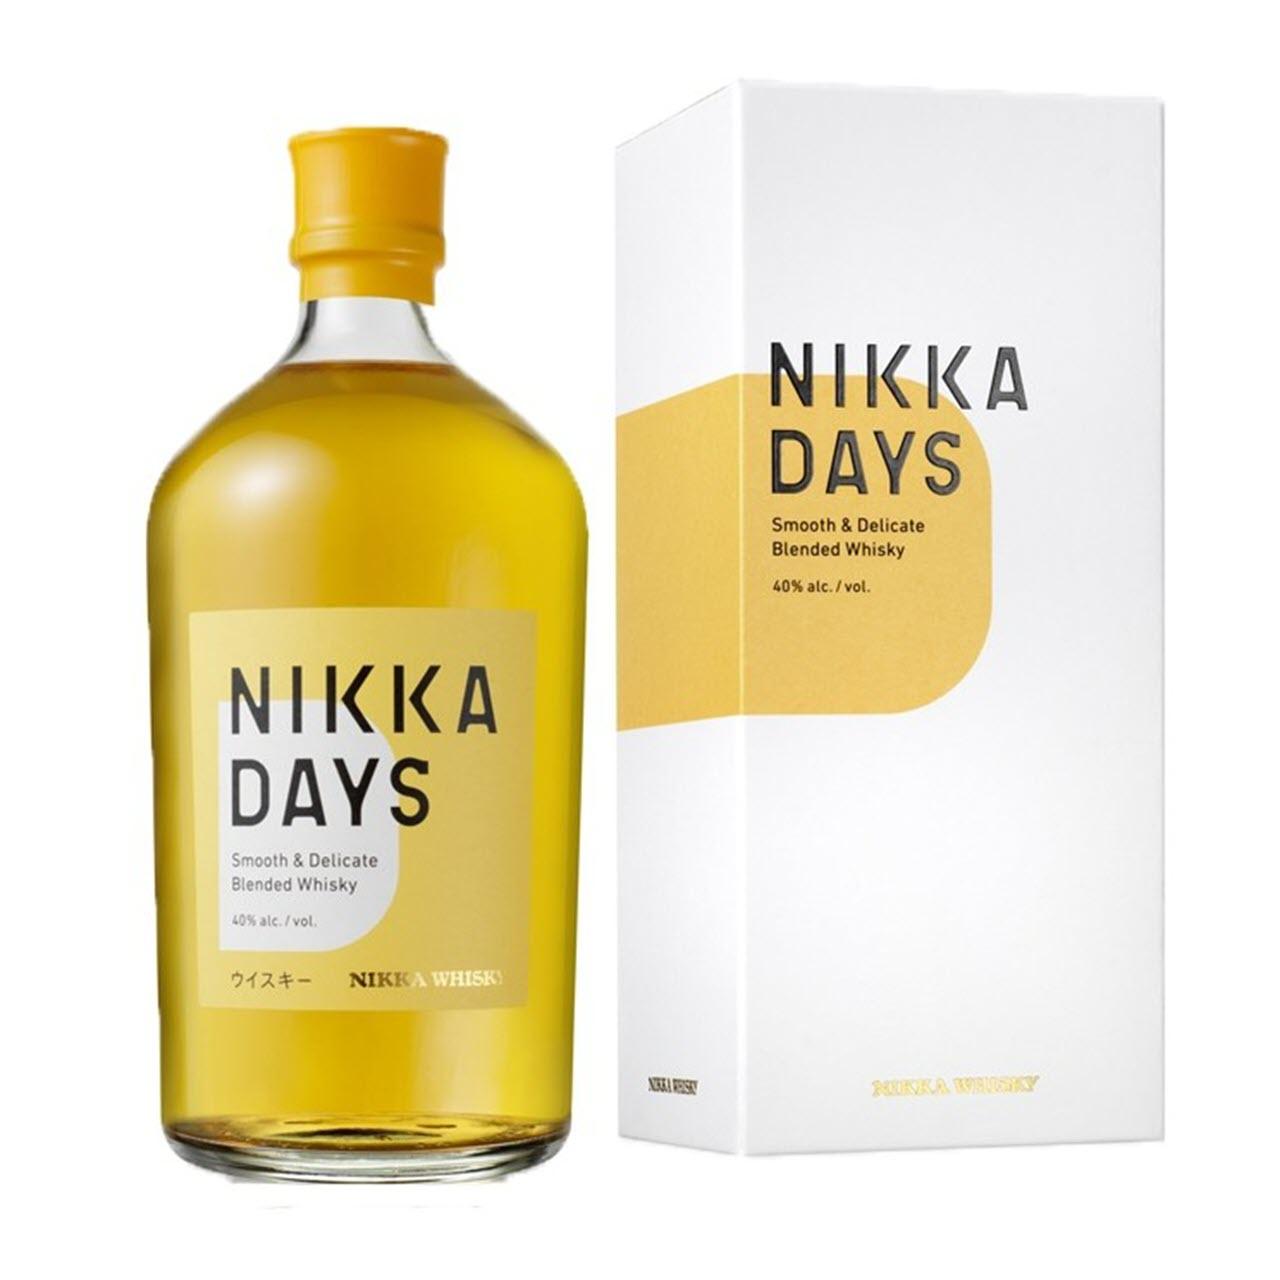 nikka-days.jpg